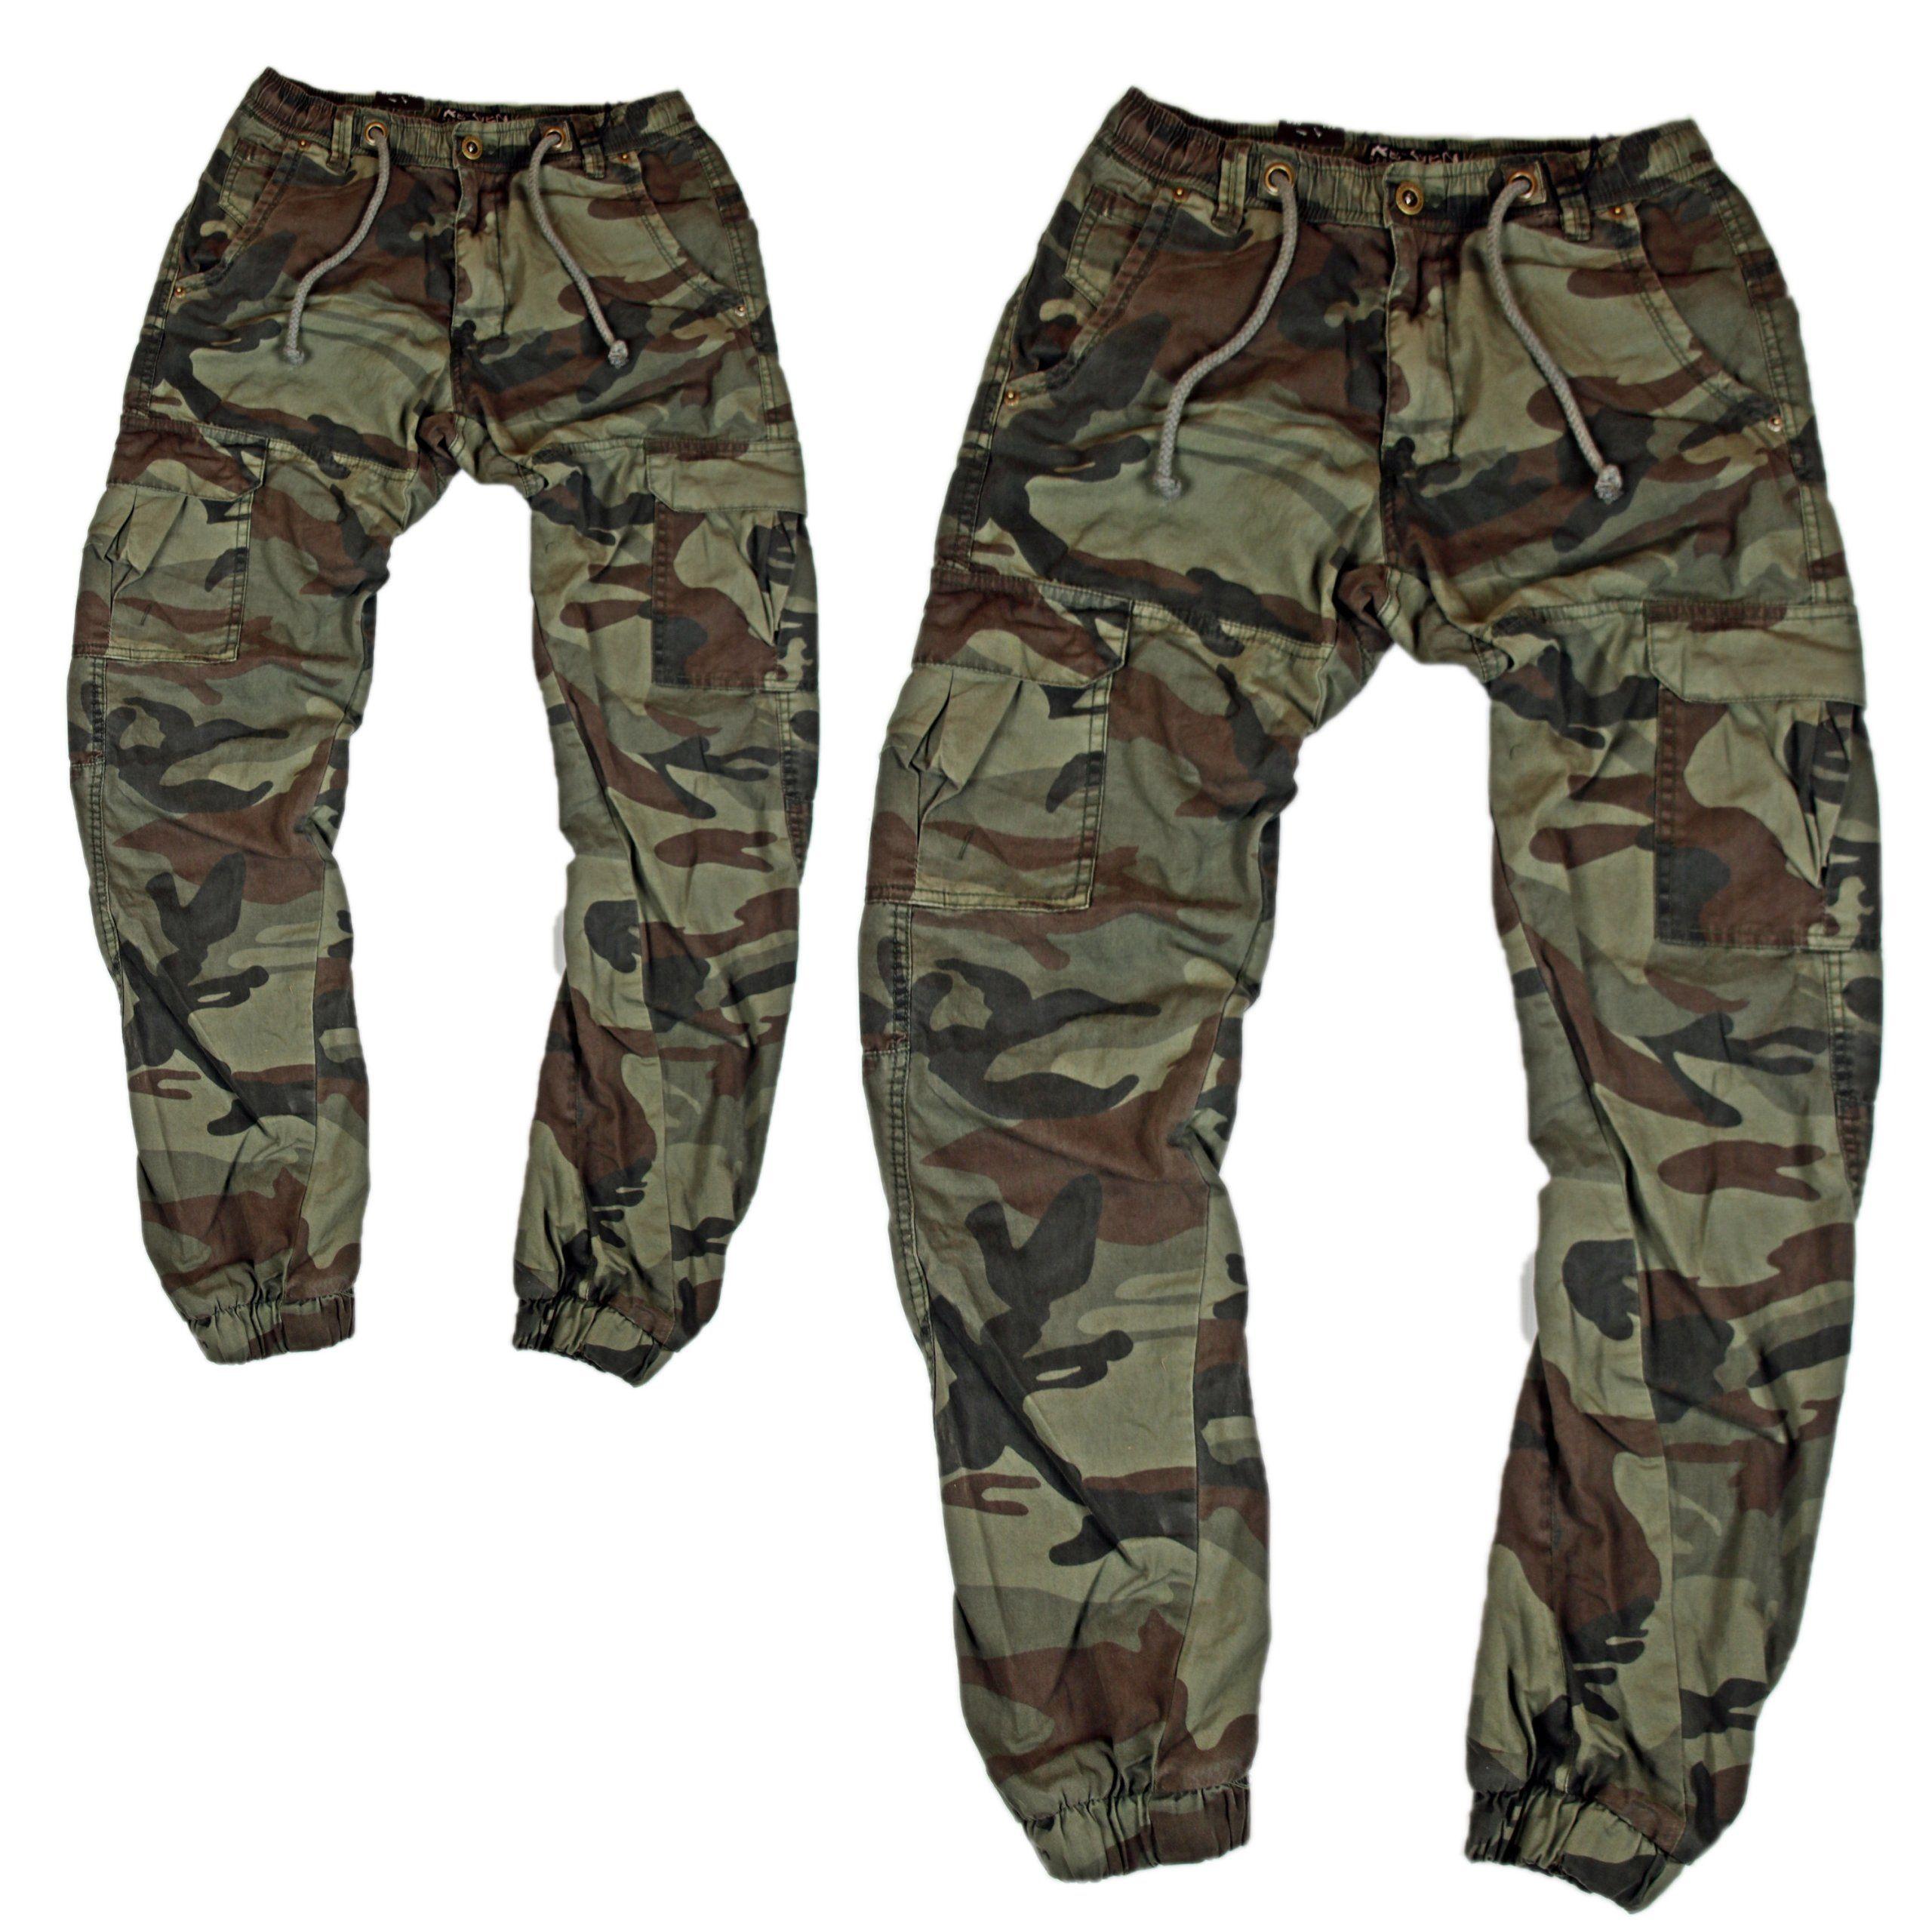 Spodnie Meskie Moro Joggery Bojowki Moro Hit 30 7232958721 Oficjalne Archiwum Allegro Cargo Shorts Fashion Parachute Pants